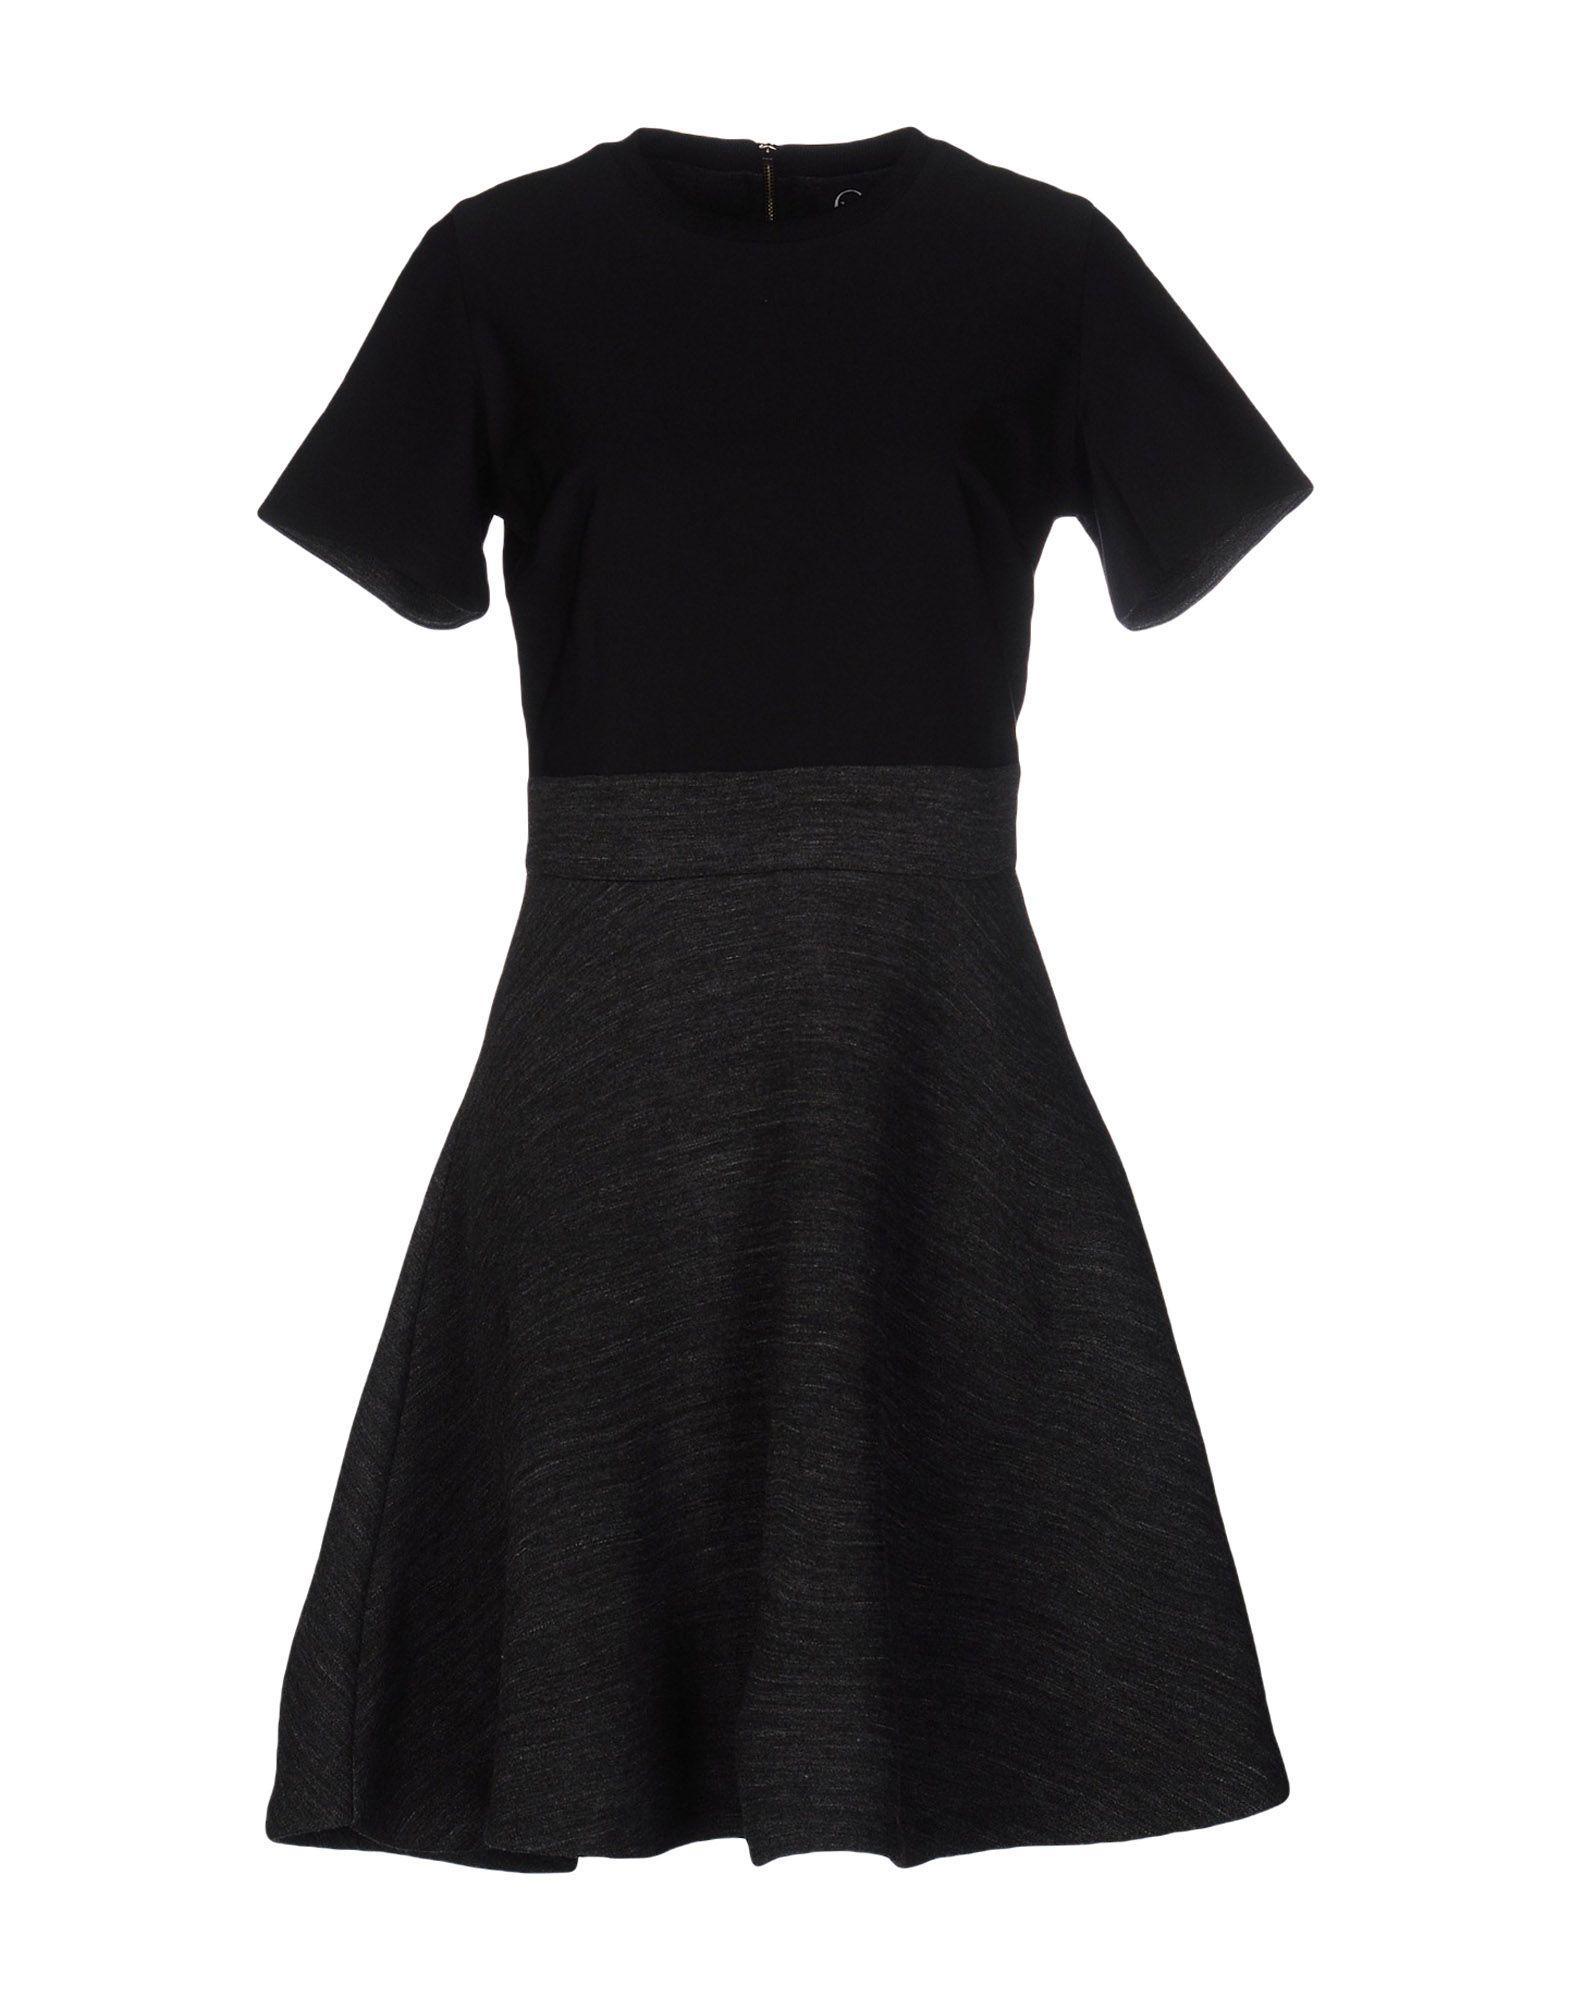 Mcq By Alexander Mcqueen Short Dress In Black